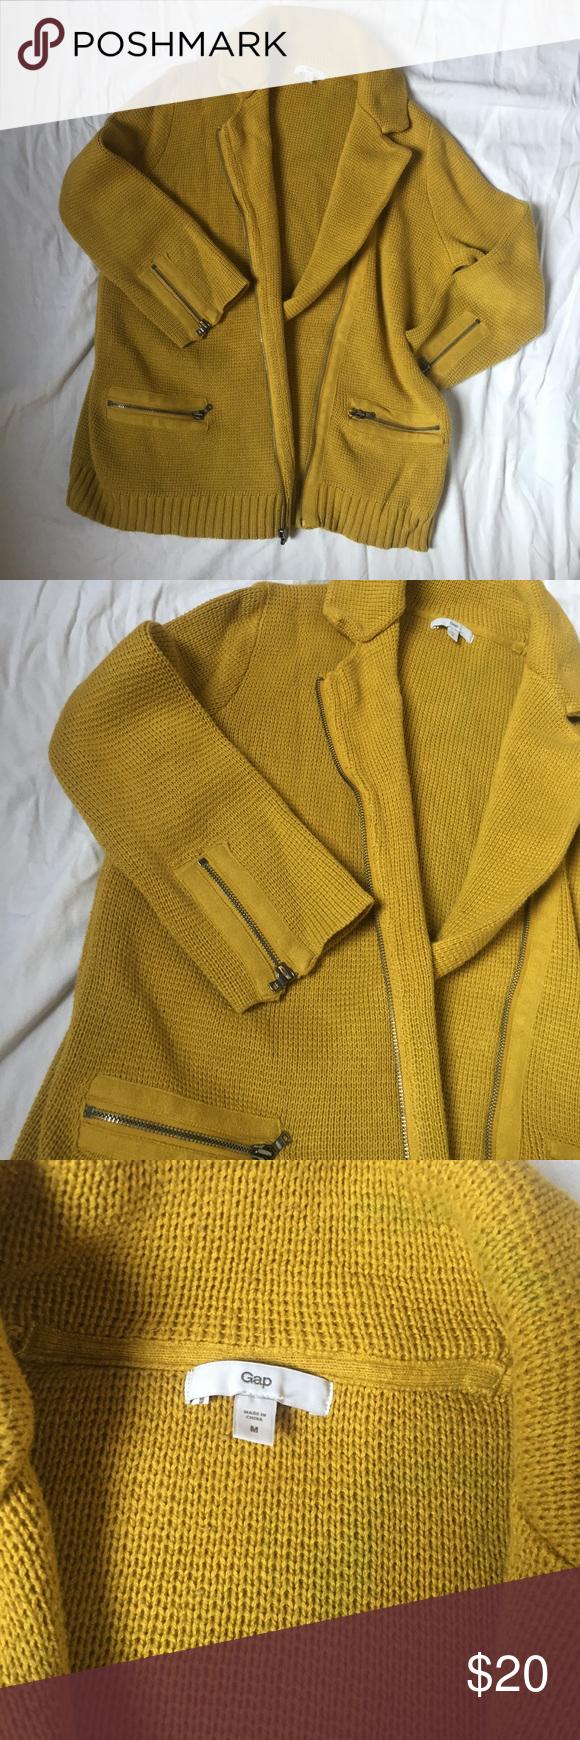 🌻SALE🌻Sweater Jacket | Yellow sweater, Mustard yellow and Mustard